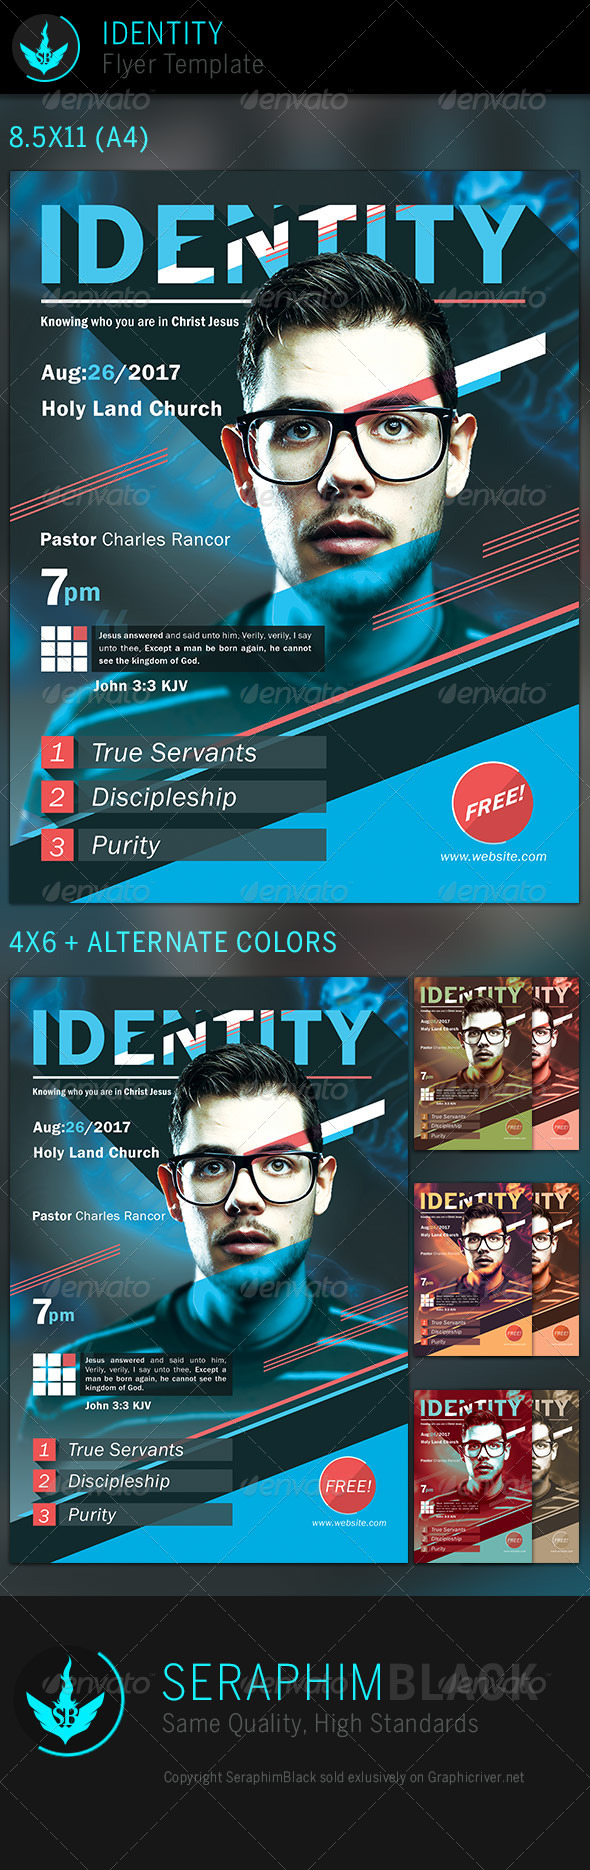 Identity: Church Flyer Template - Church Flyers